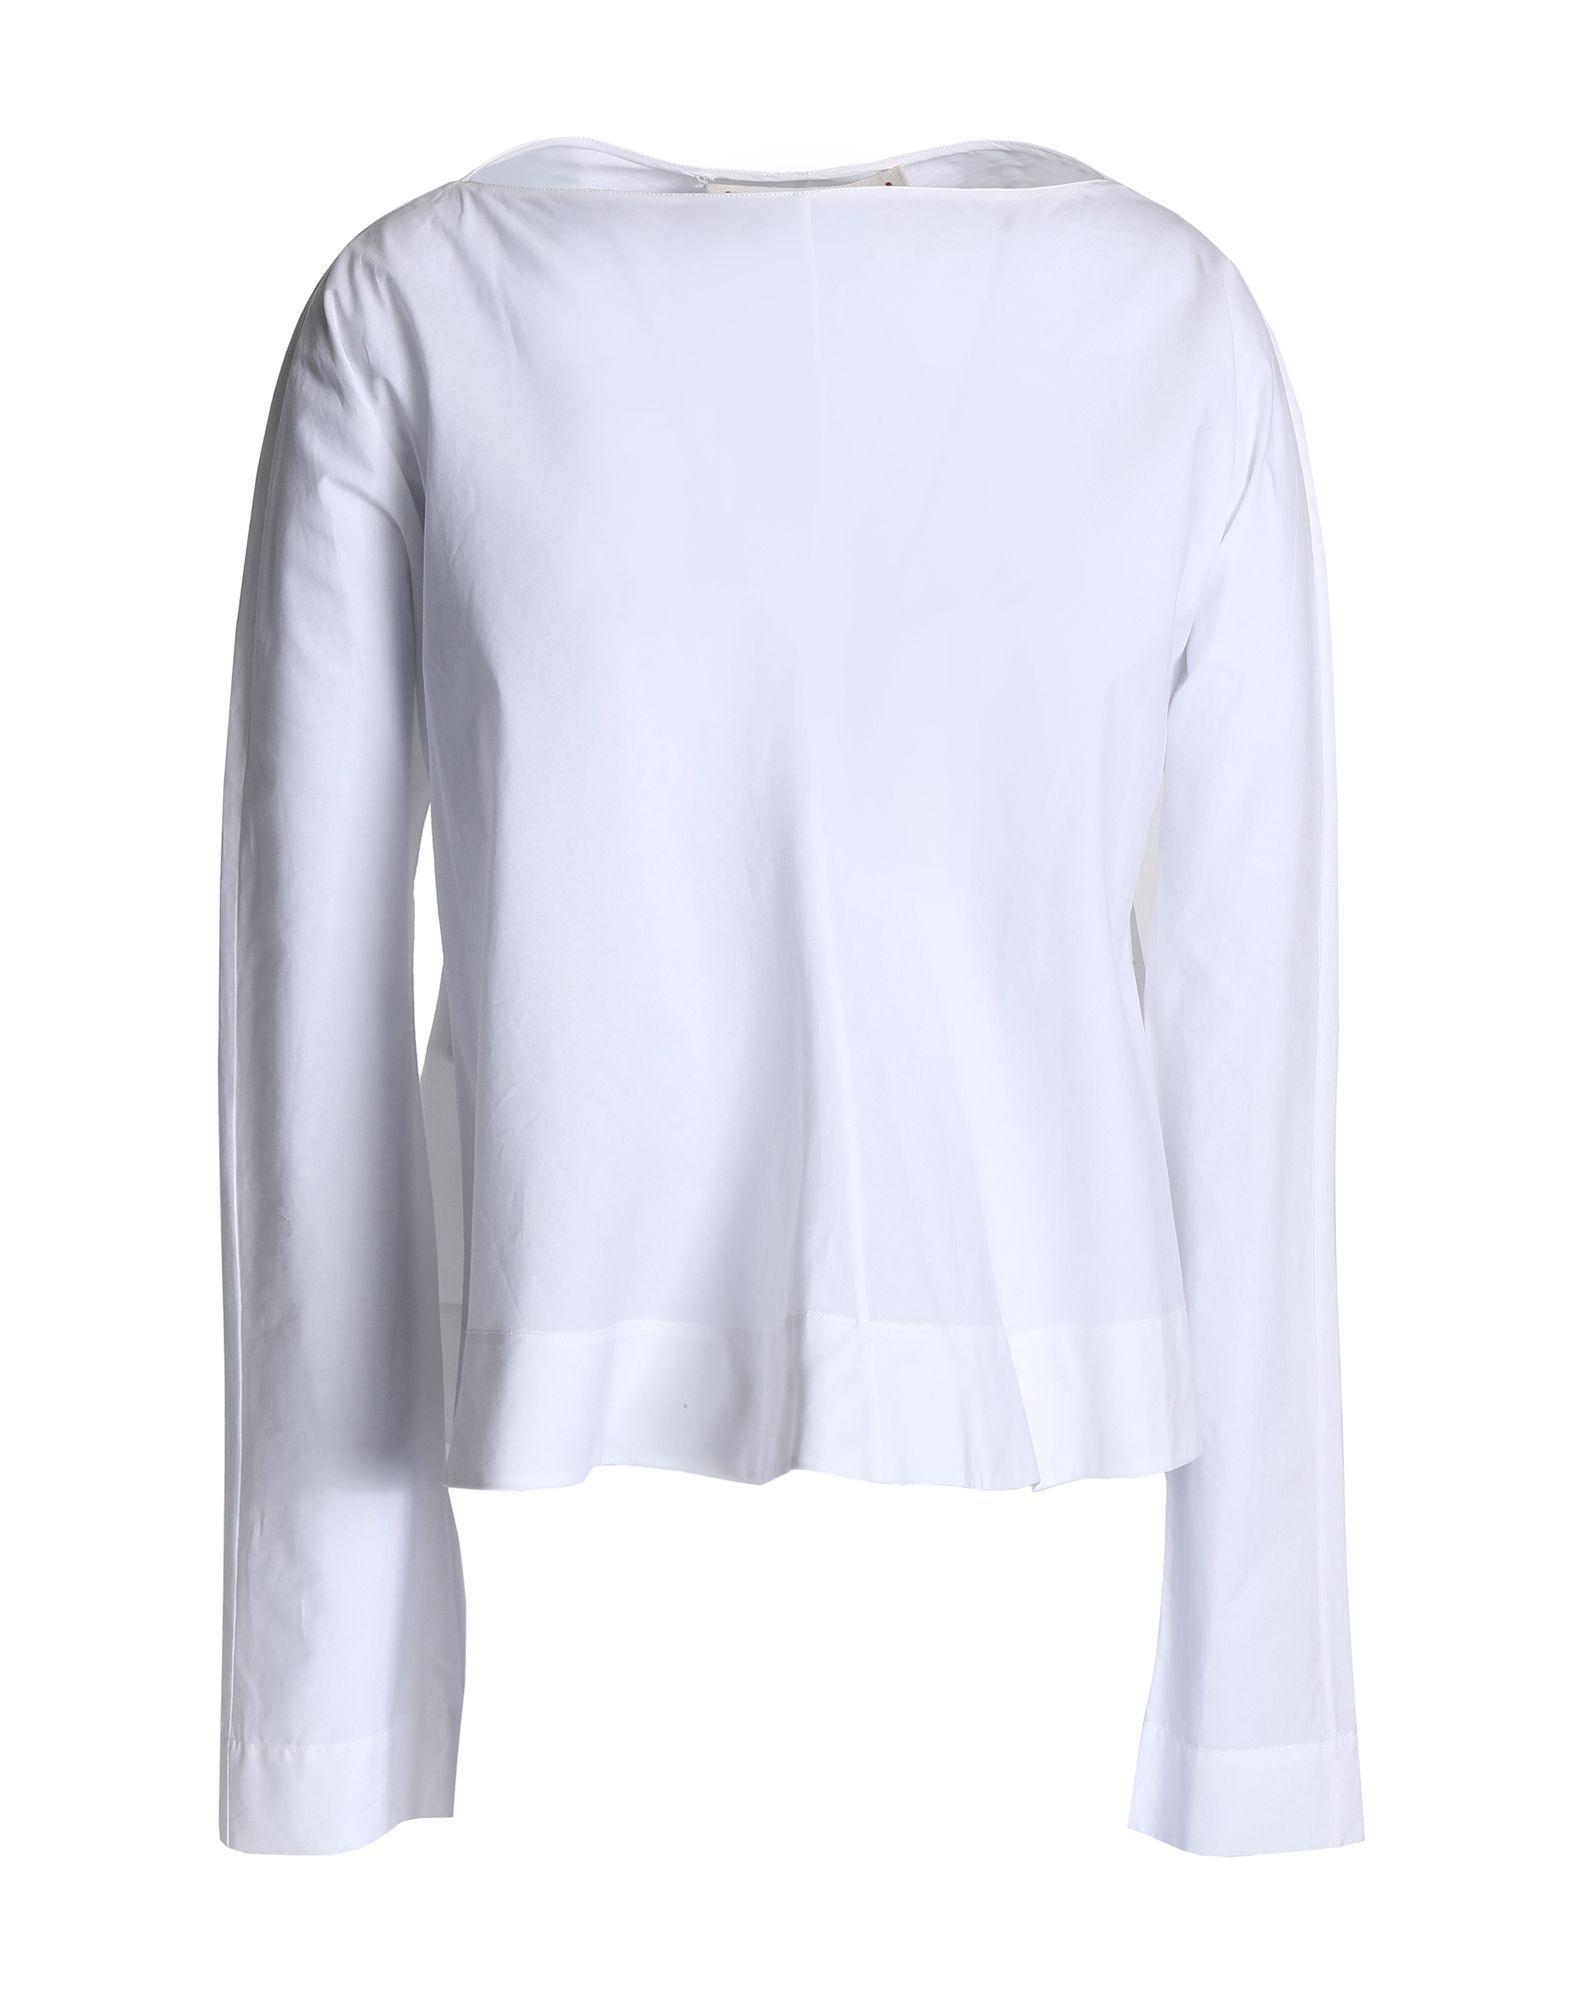 Marni White Cotton Blouse